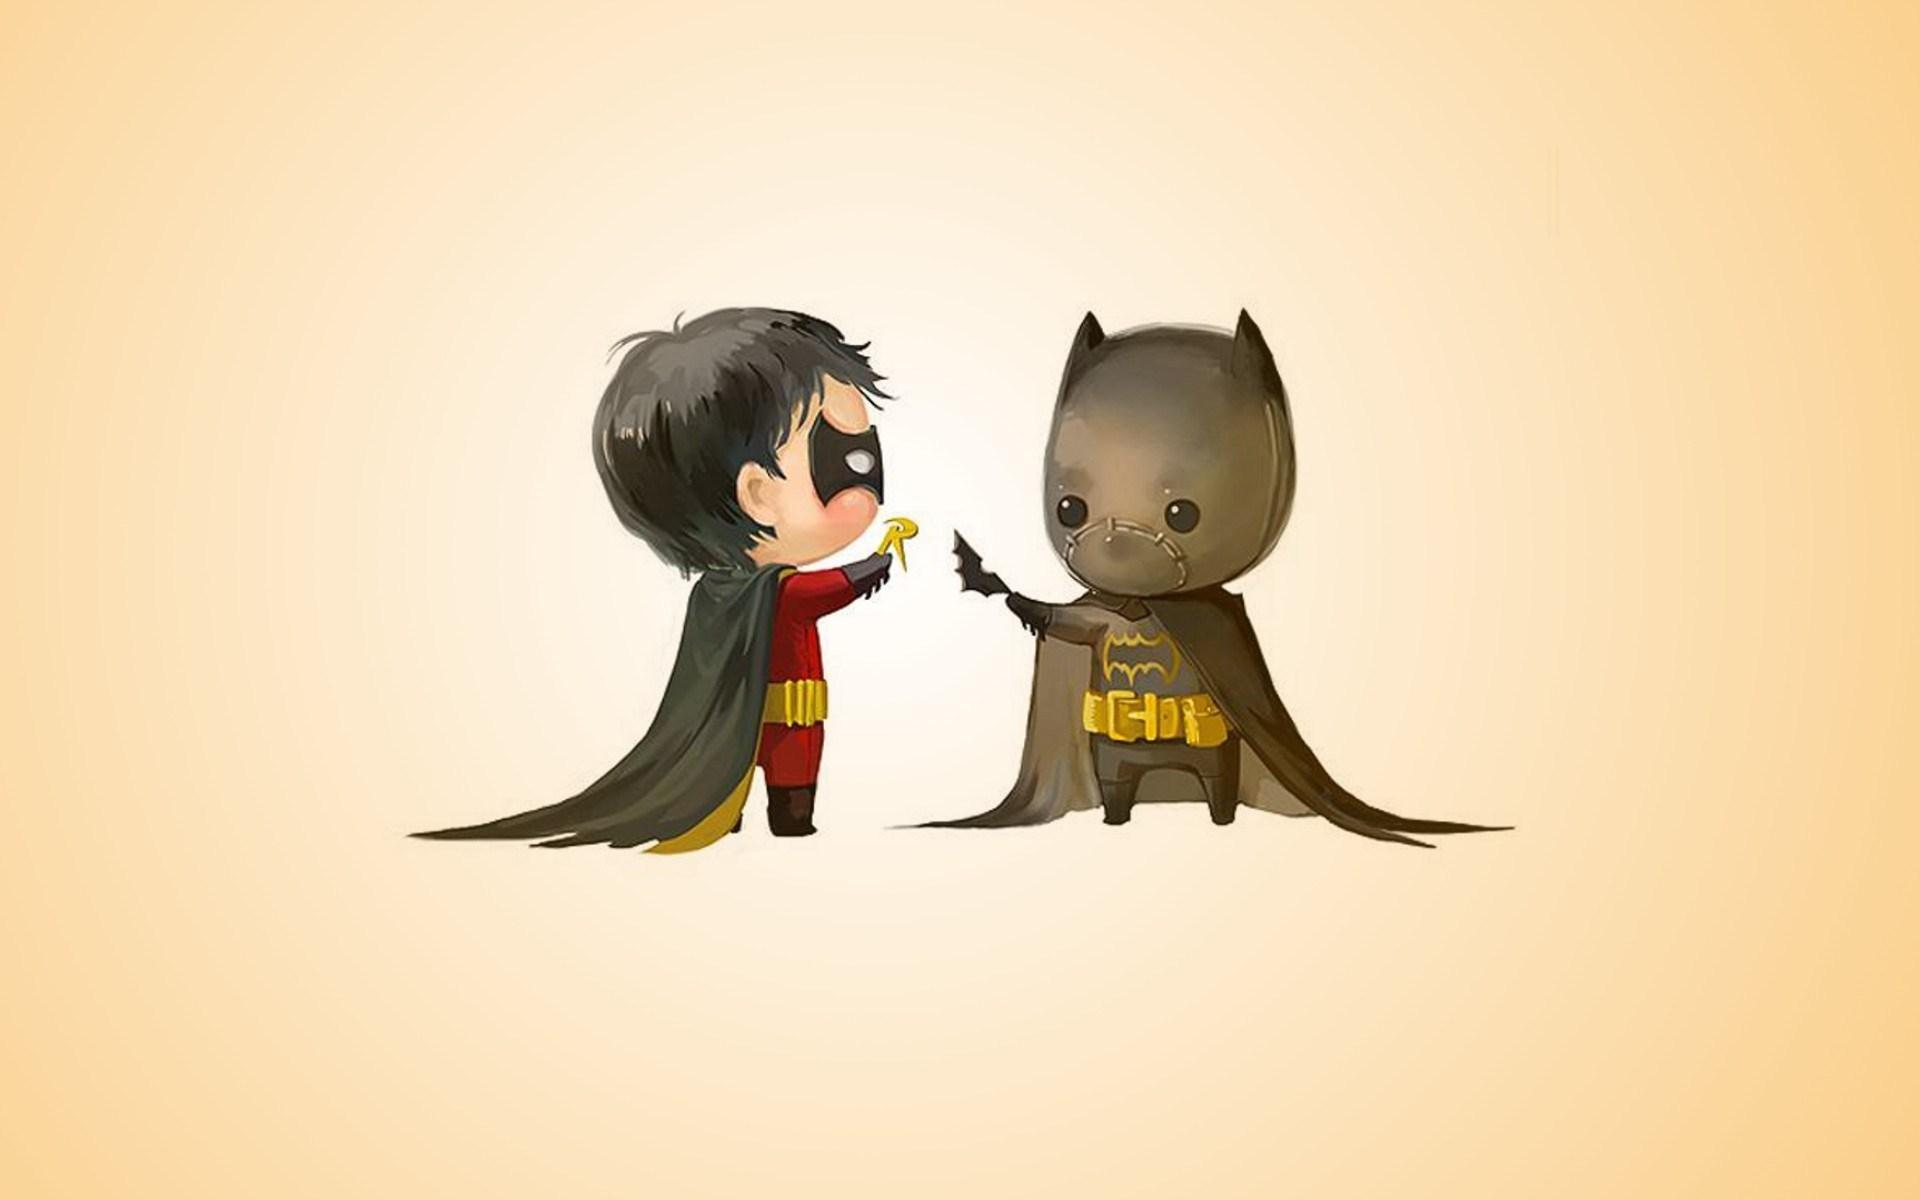 batman and robin cartoon funny cute 1920x1200jpg 1920x1200